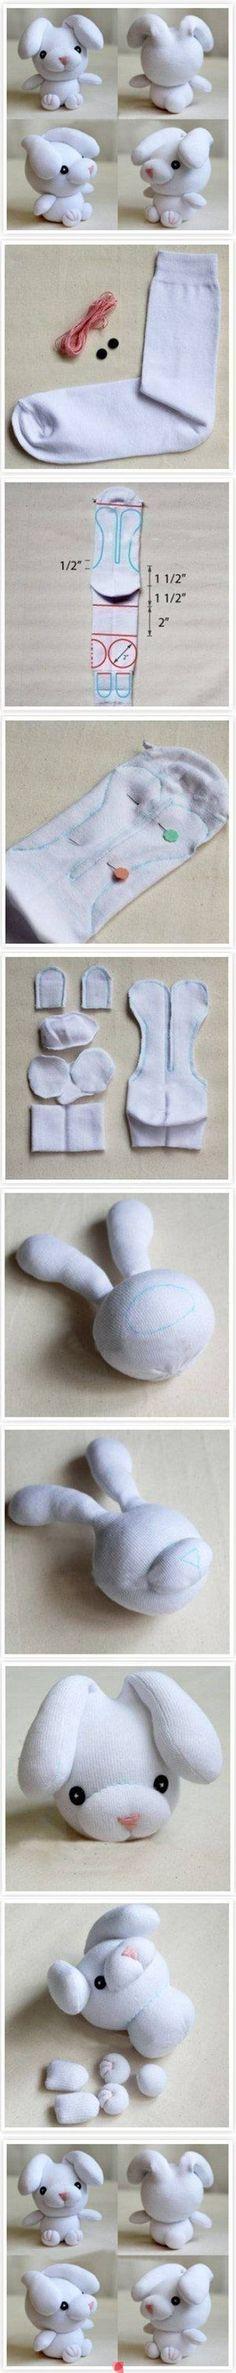 Oh, so cute. White sock toys. #Socktoys